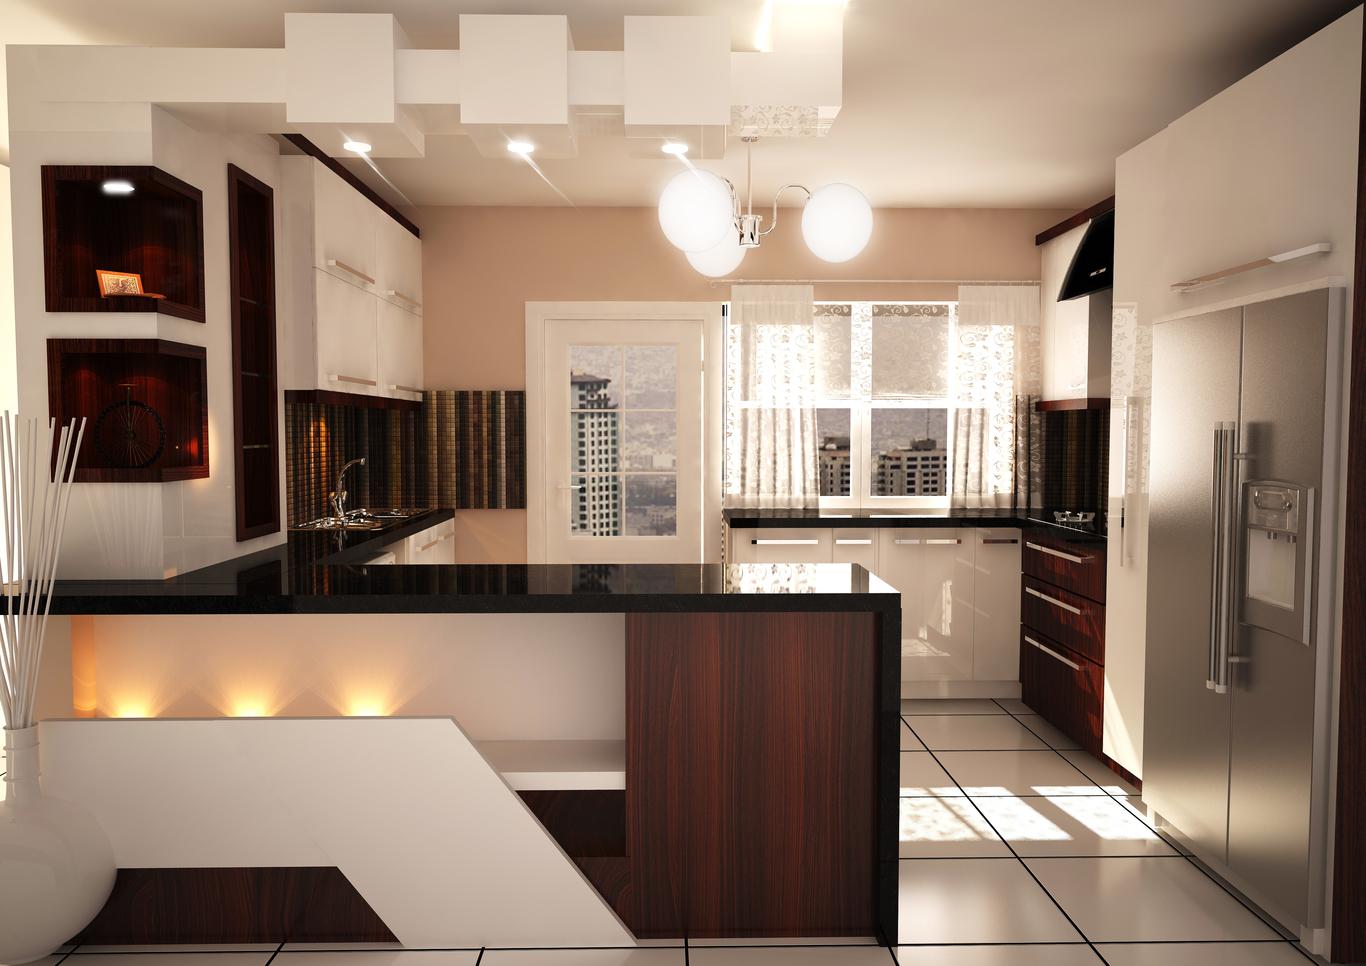 Alireza1394 kitchen design 1 184dcaf6 a8k2